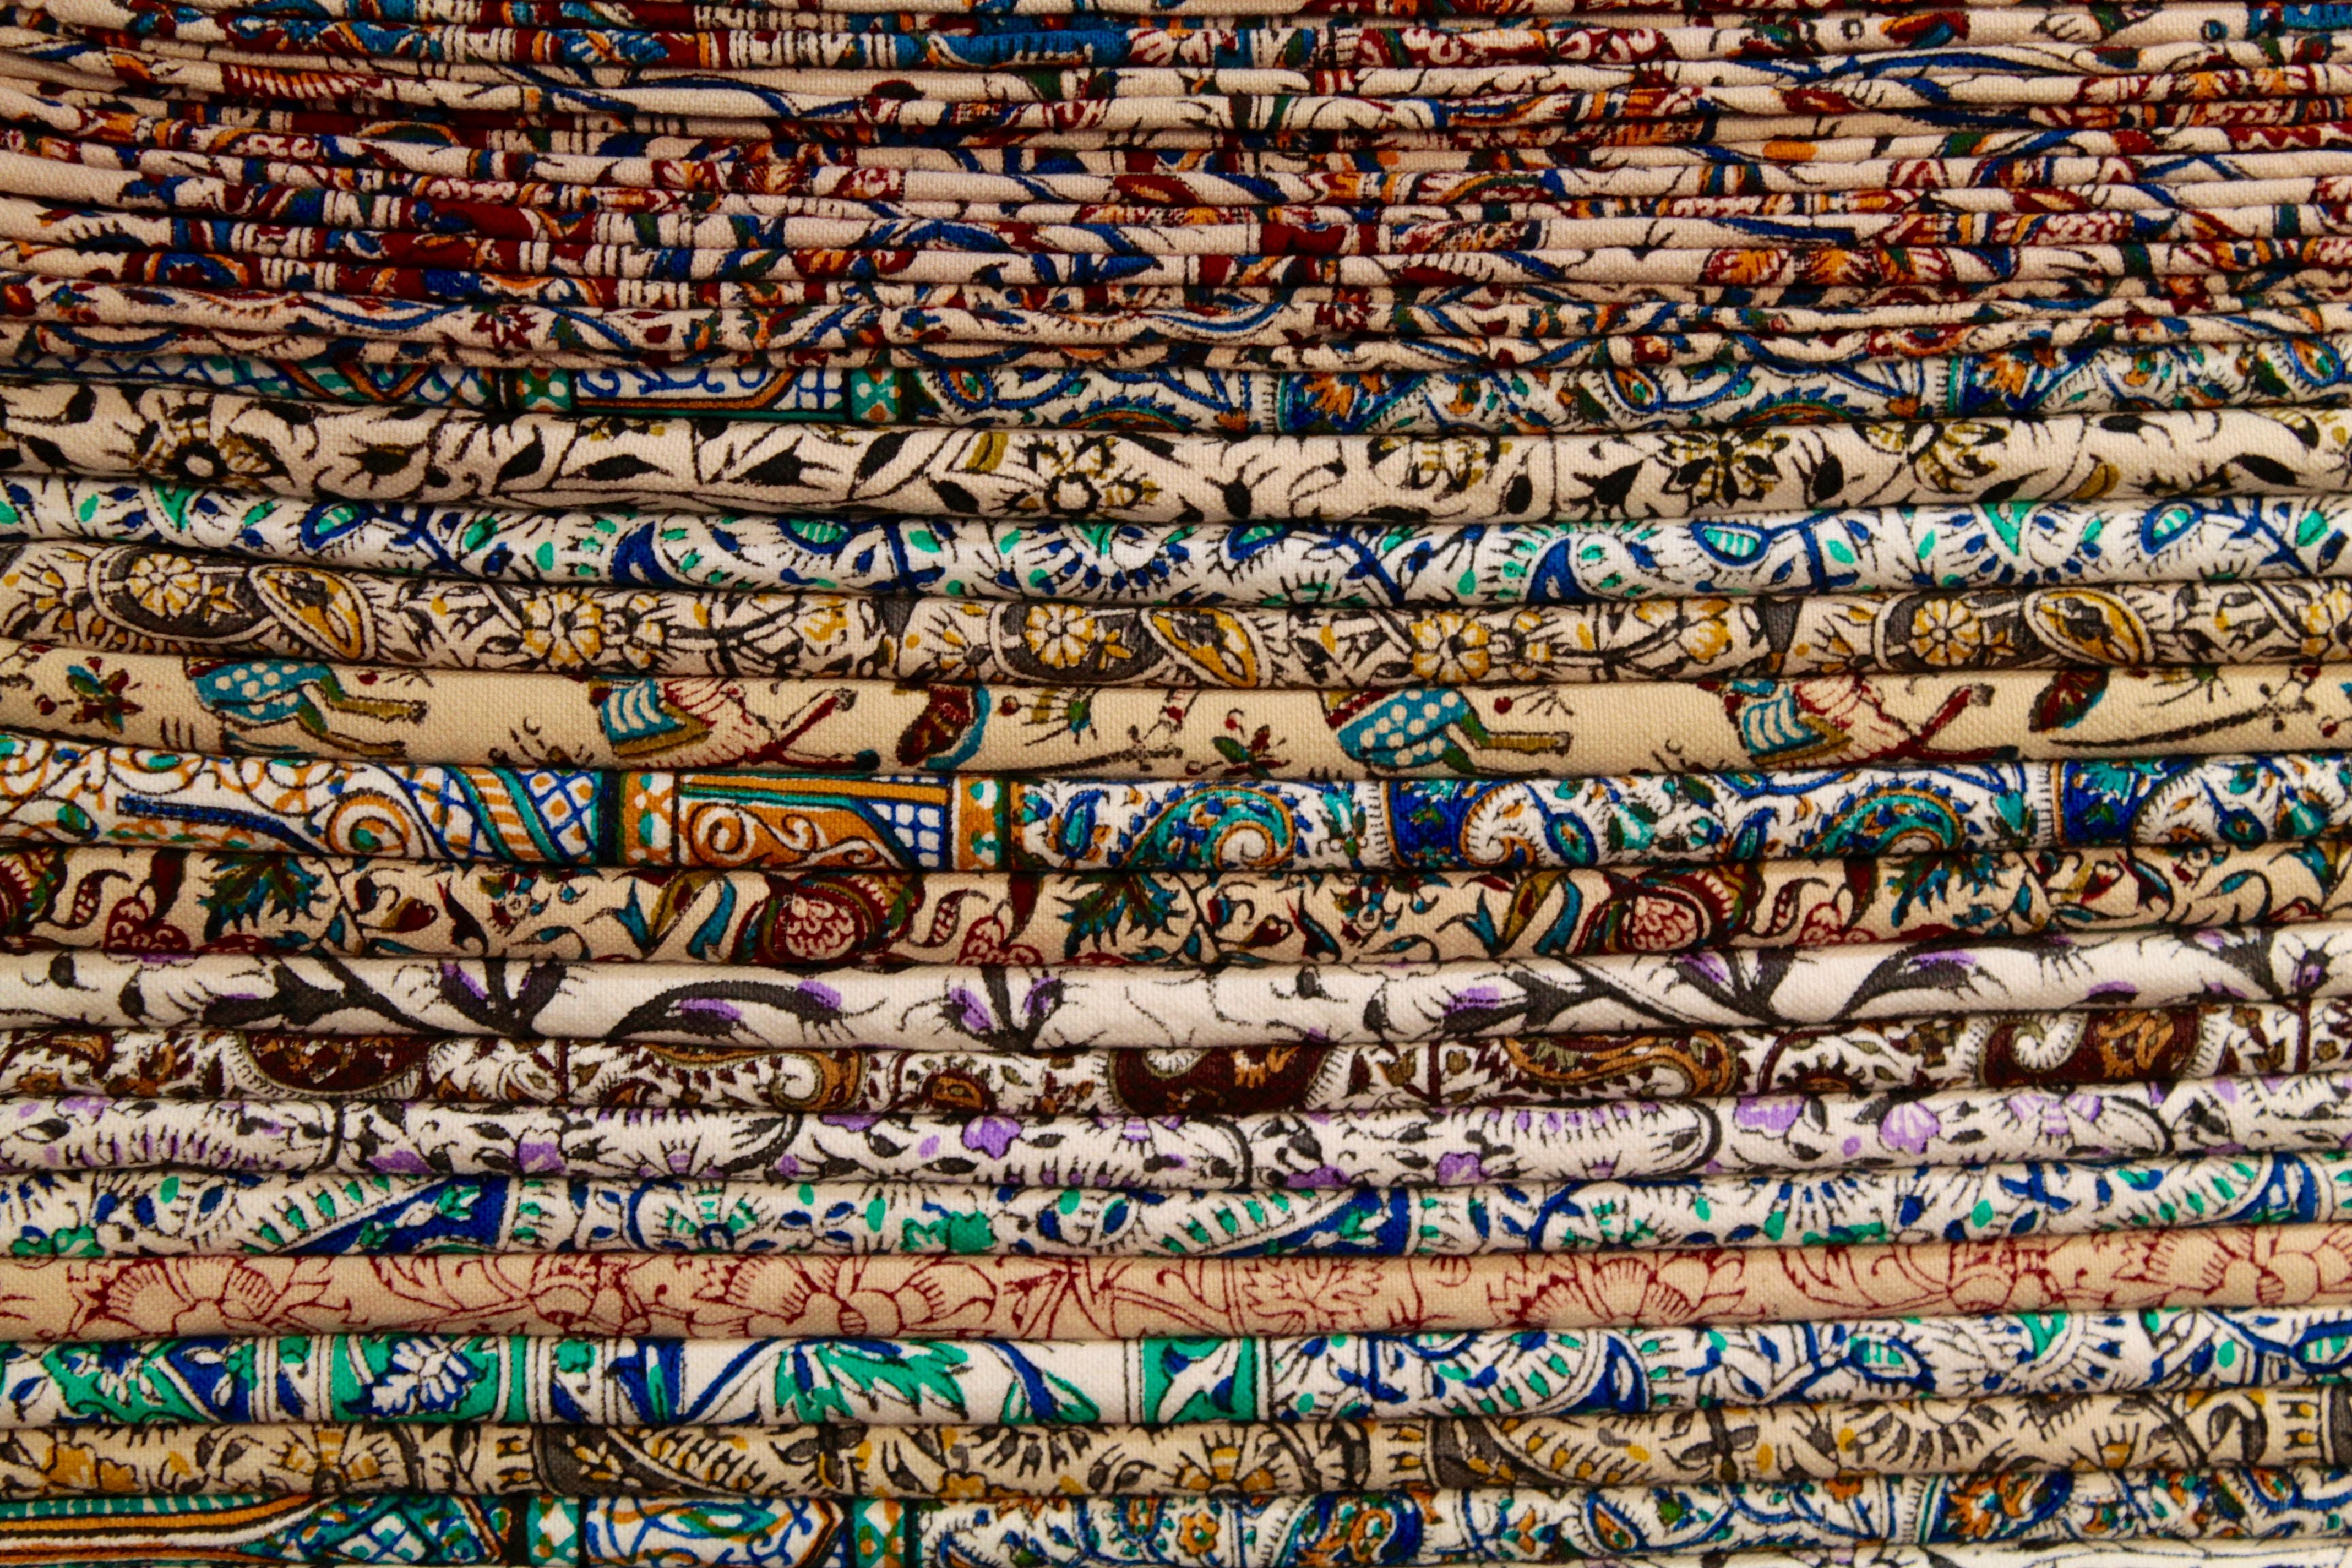 Image of Persian fabrics